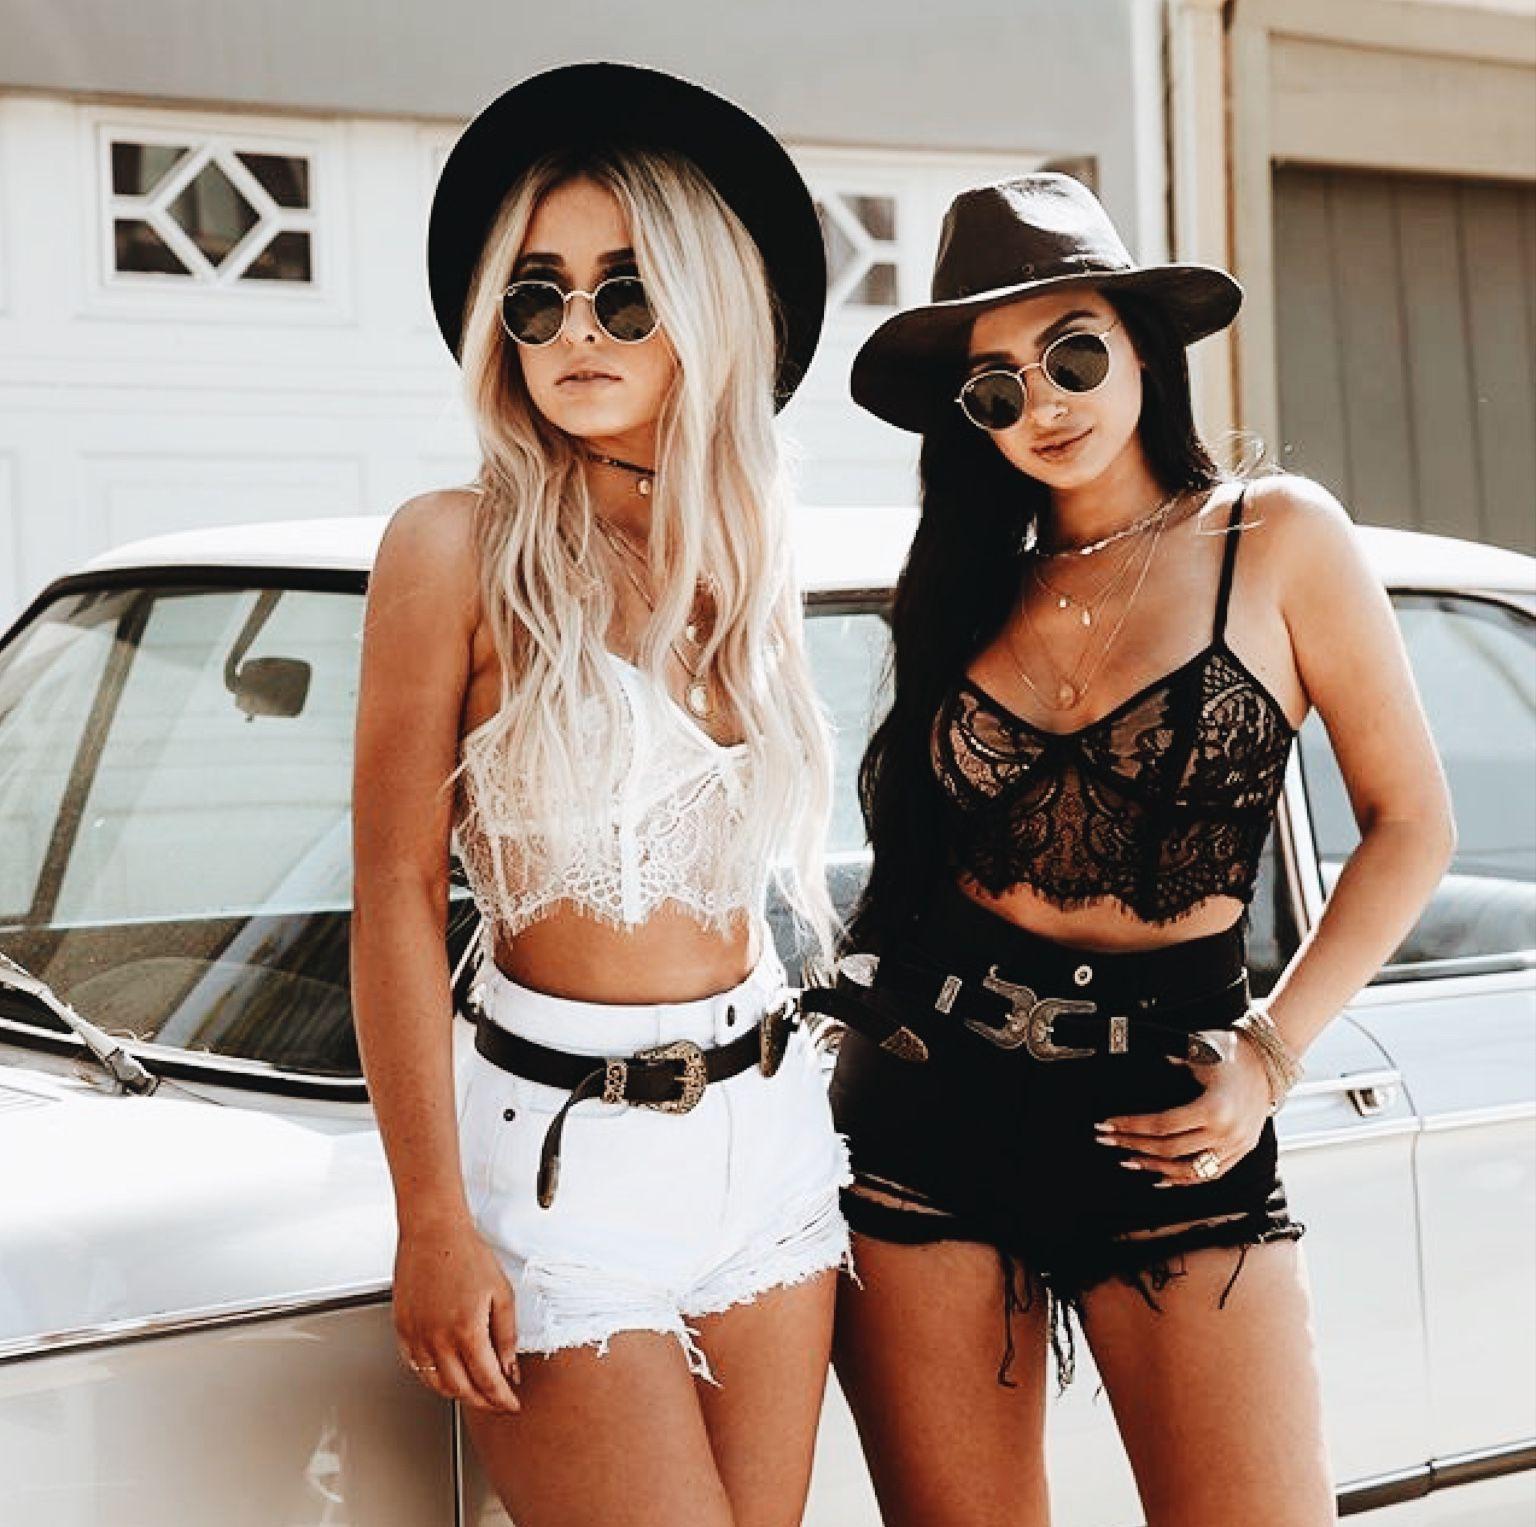 white outfits for girls with sleeveless shirt, shorts, sunglasses, eyewear